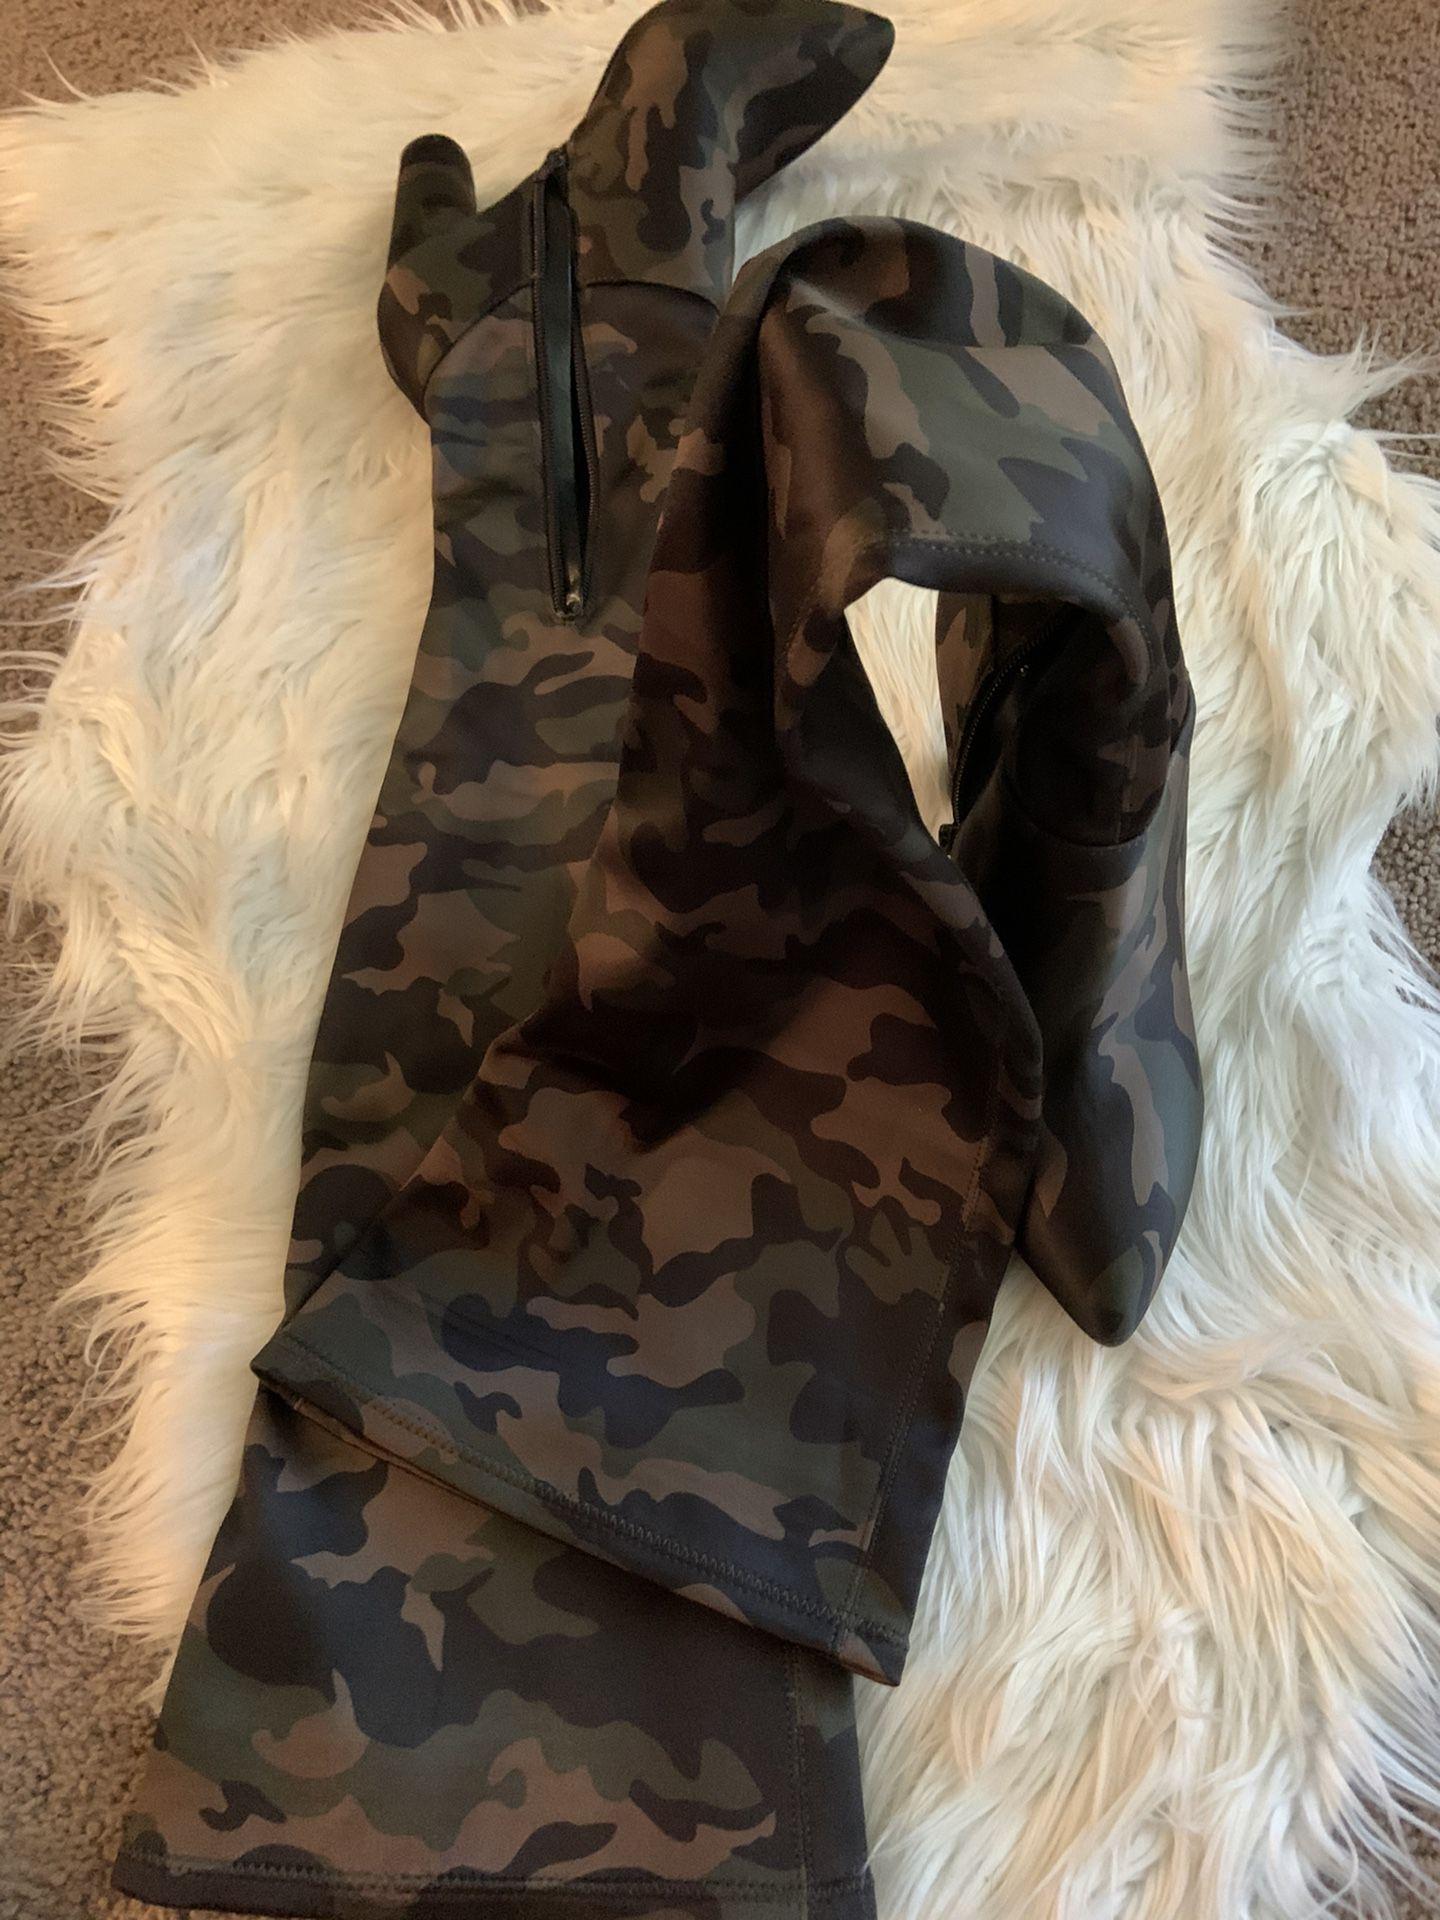 ALDO Army Fatigue High Boots (Size 8.5)